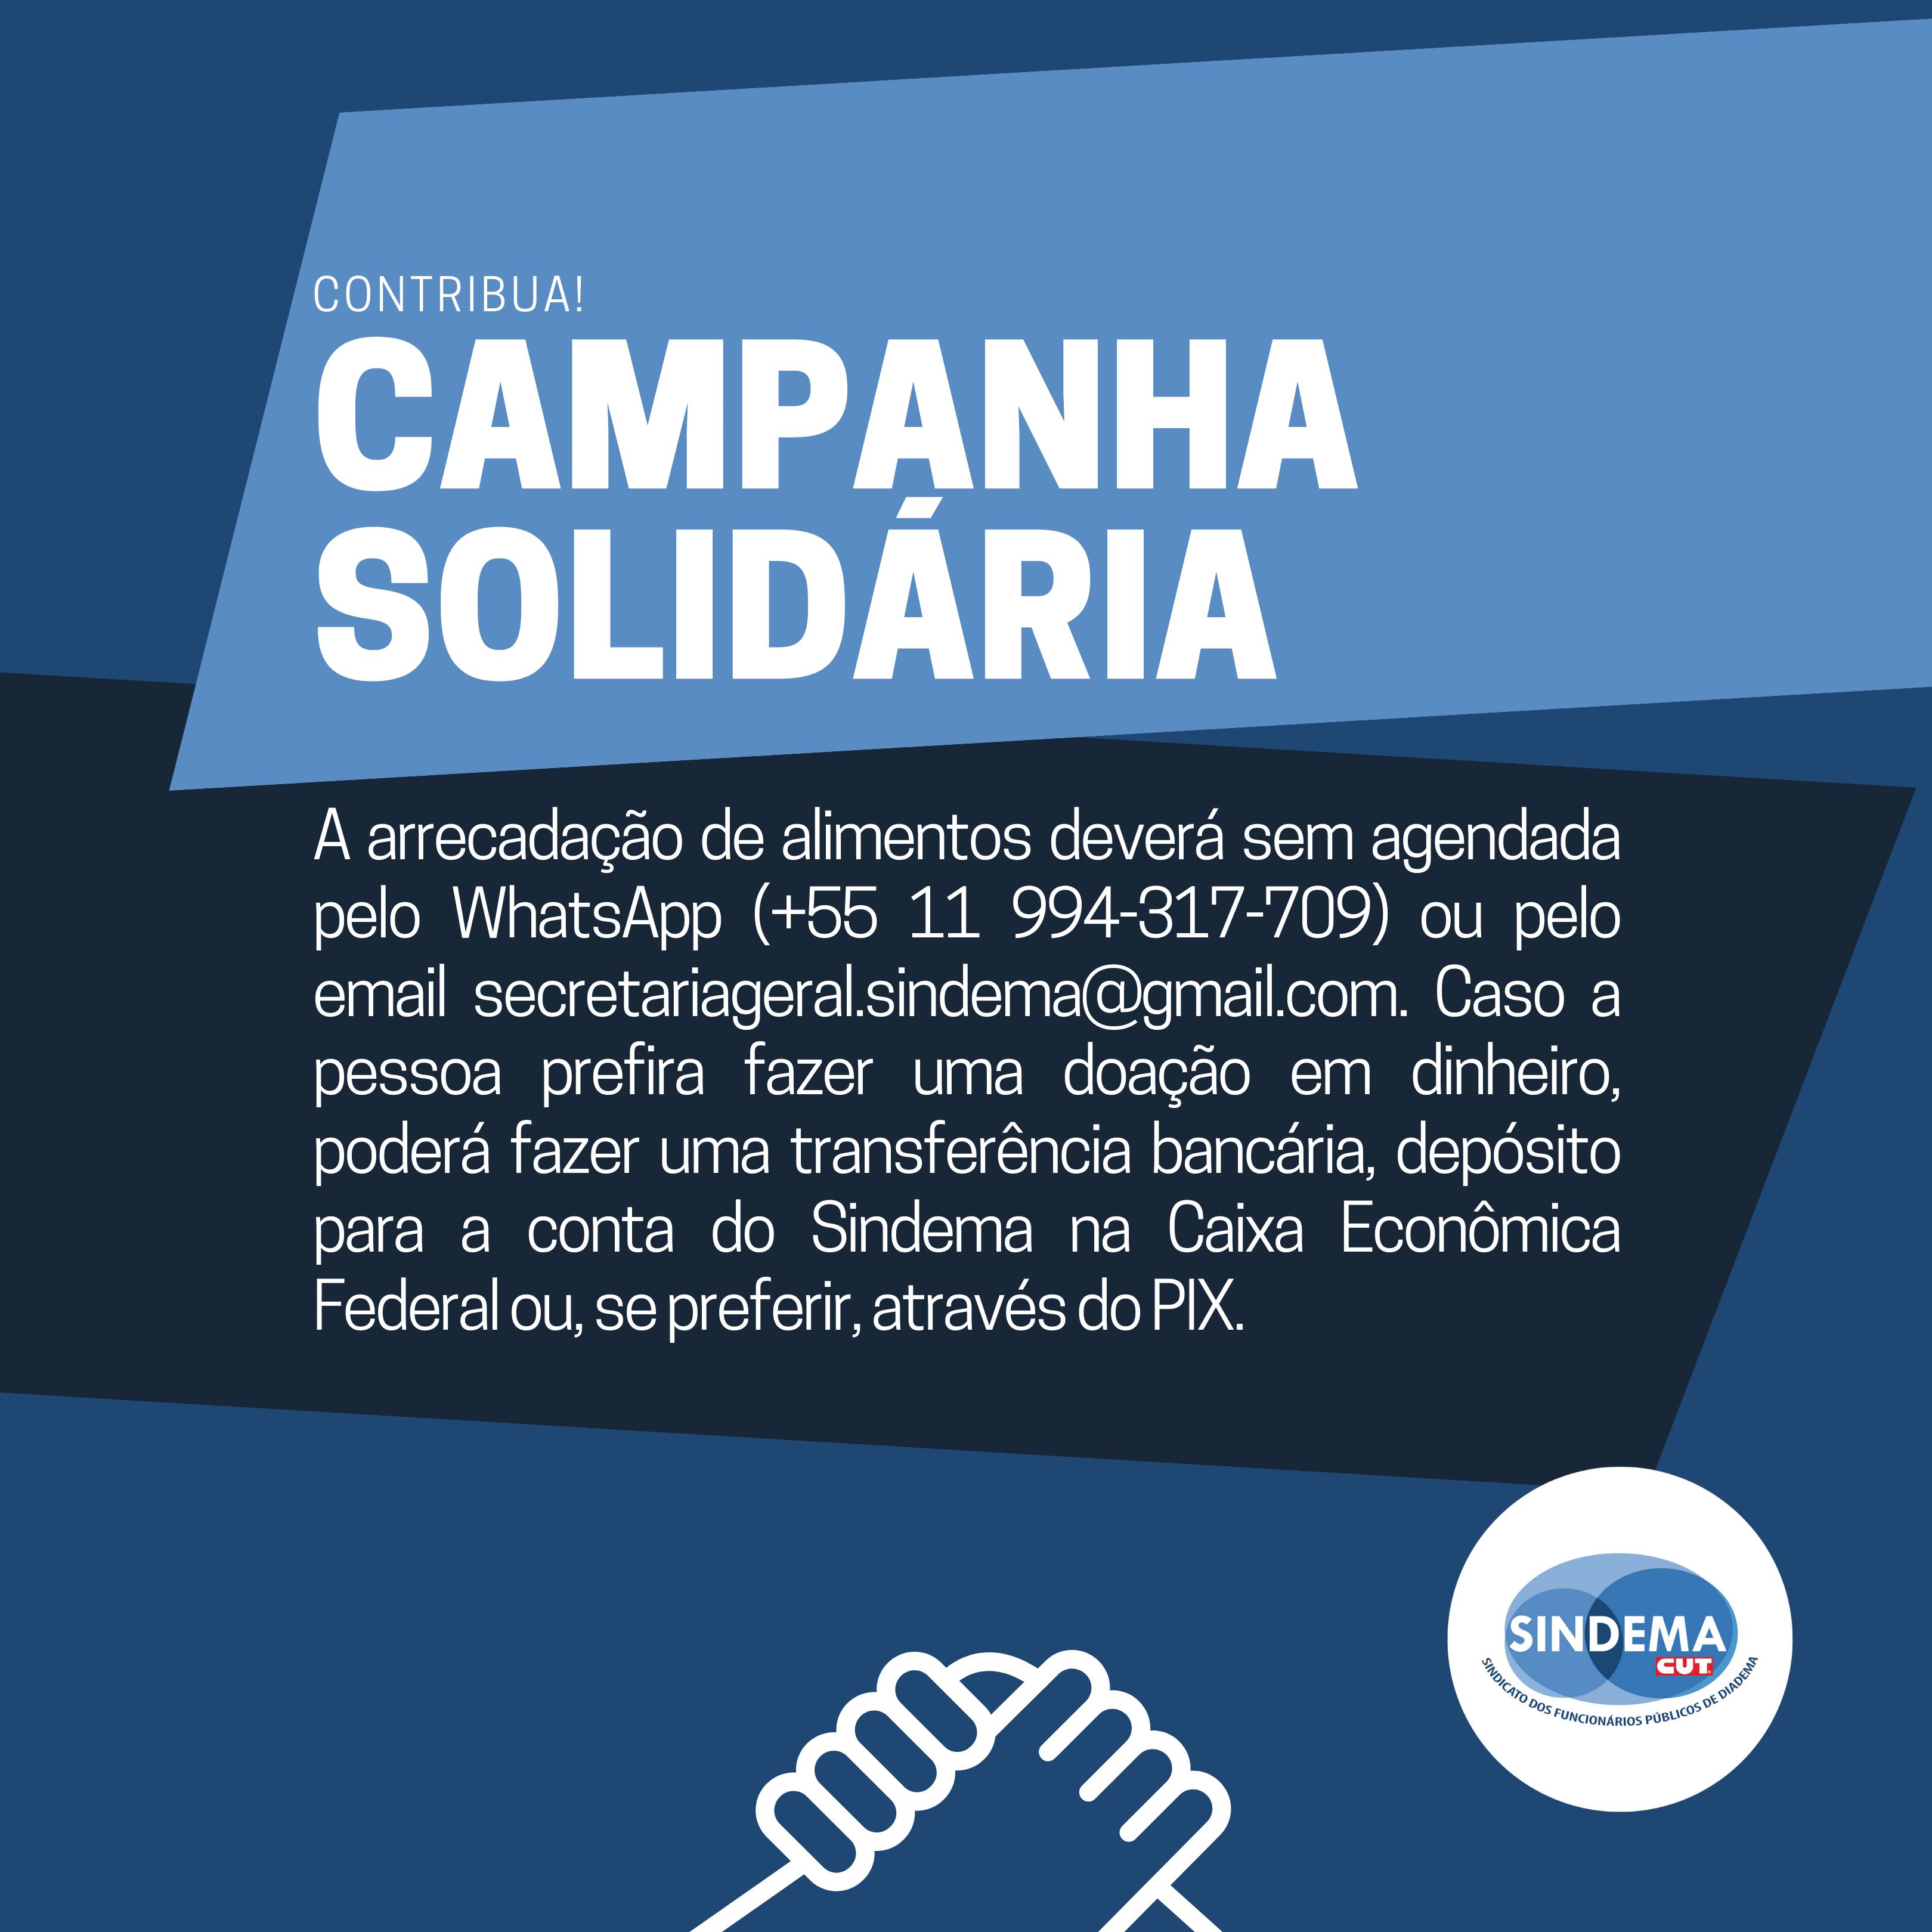 Campanha de Solidariedade agora aceita PIX.